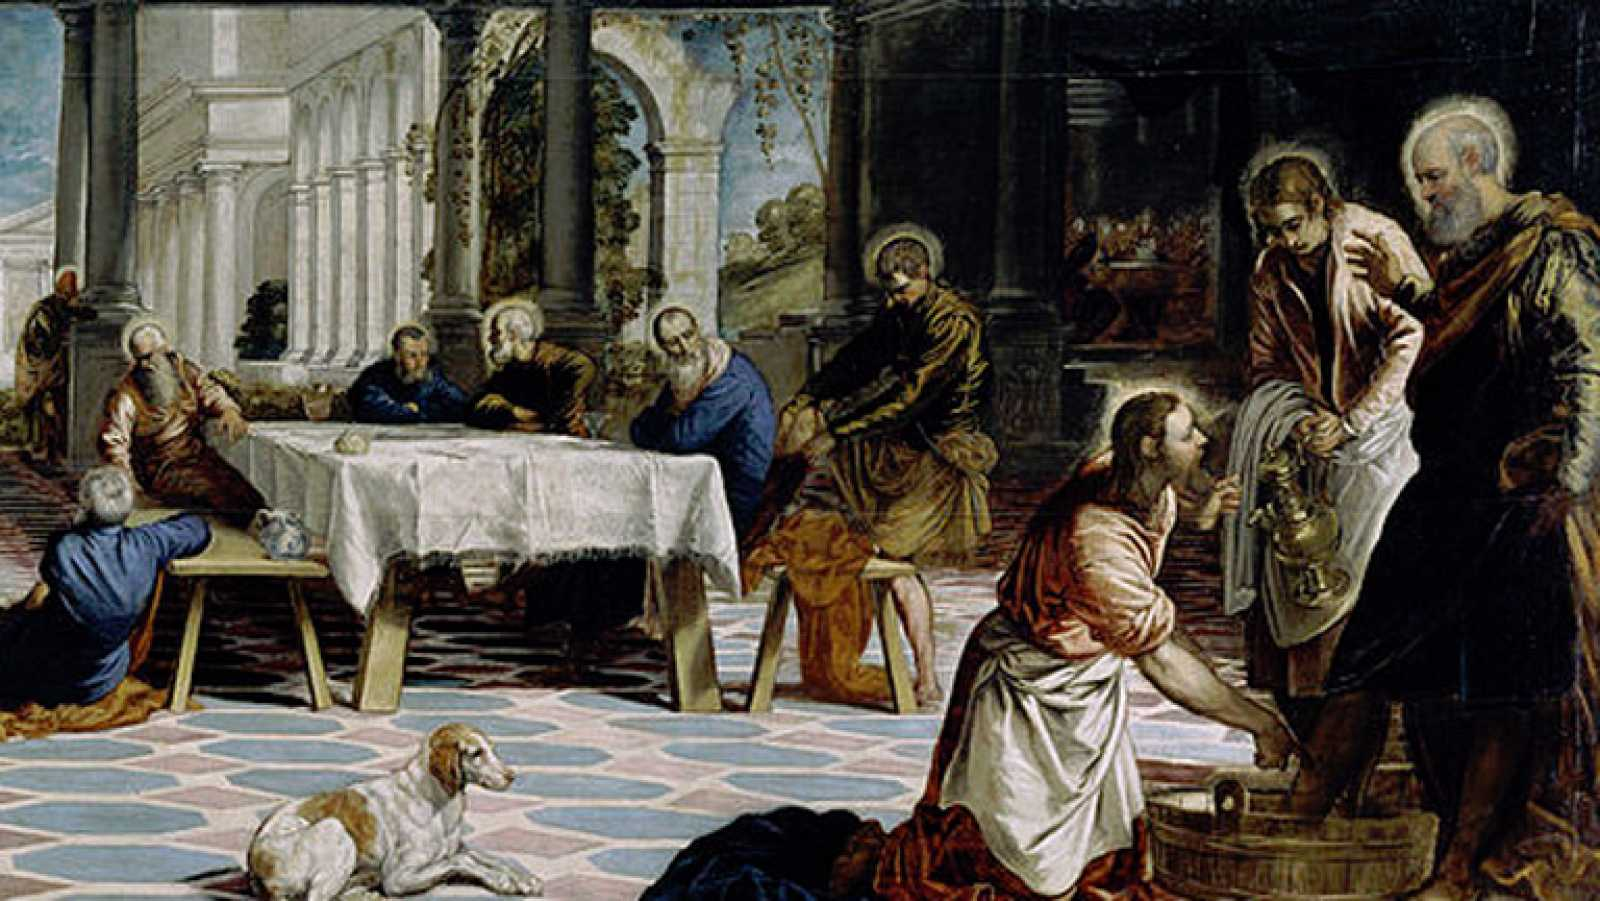 Mirar un cuadro - El lavatorio (Tintoretto)